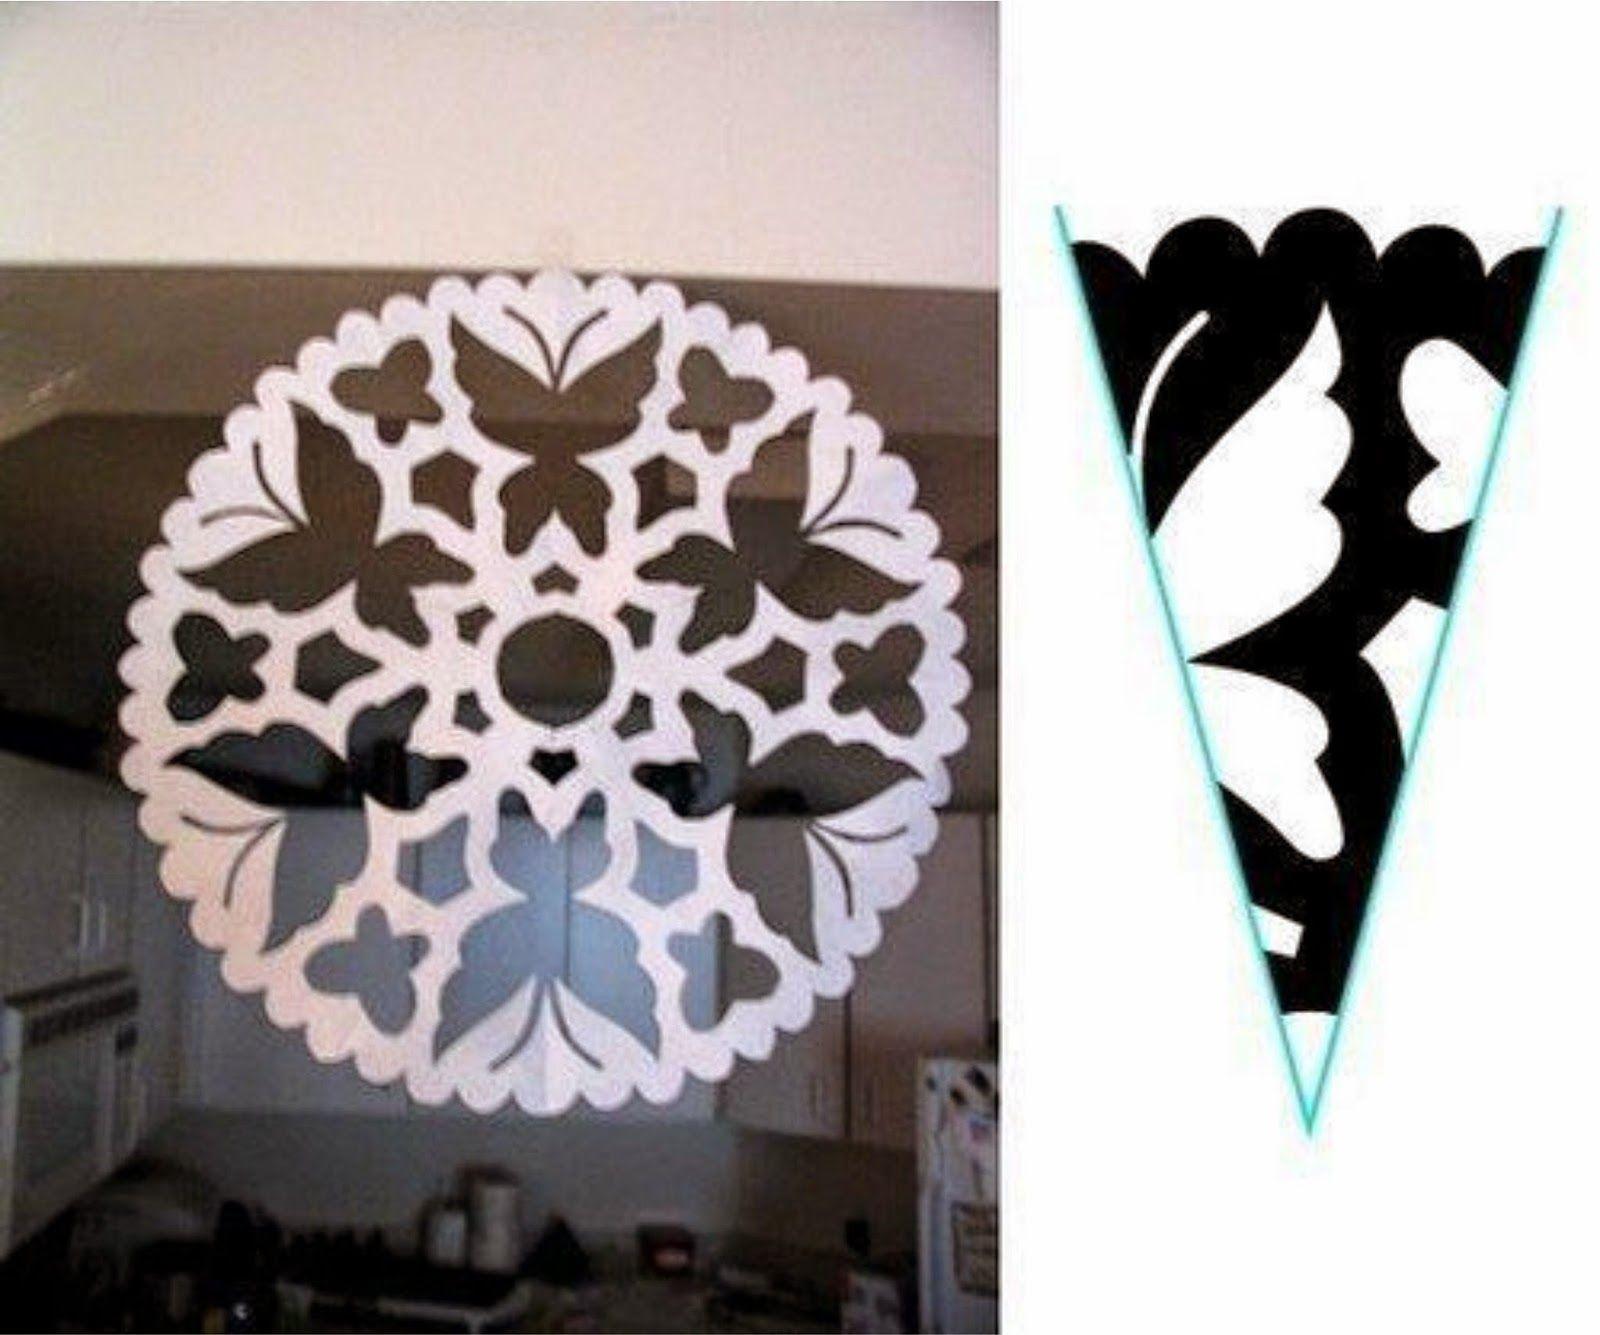 Developer Workshop: Craft Corner | Paper cuttings | Paper snowflakes